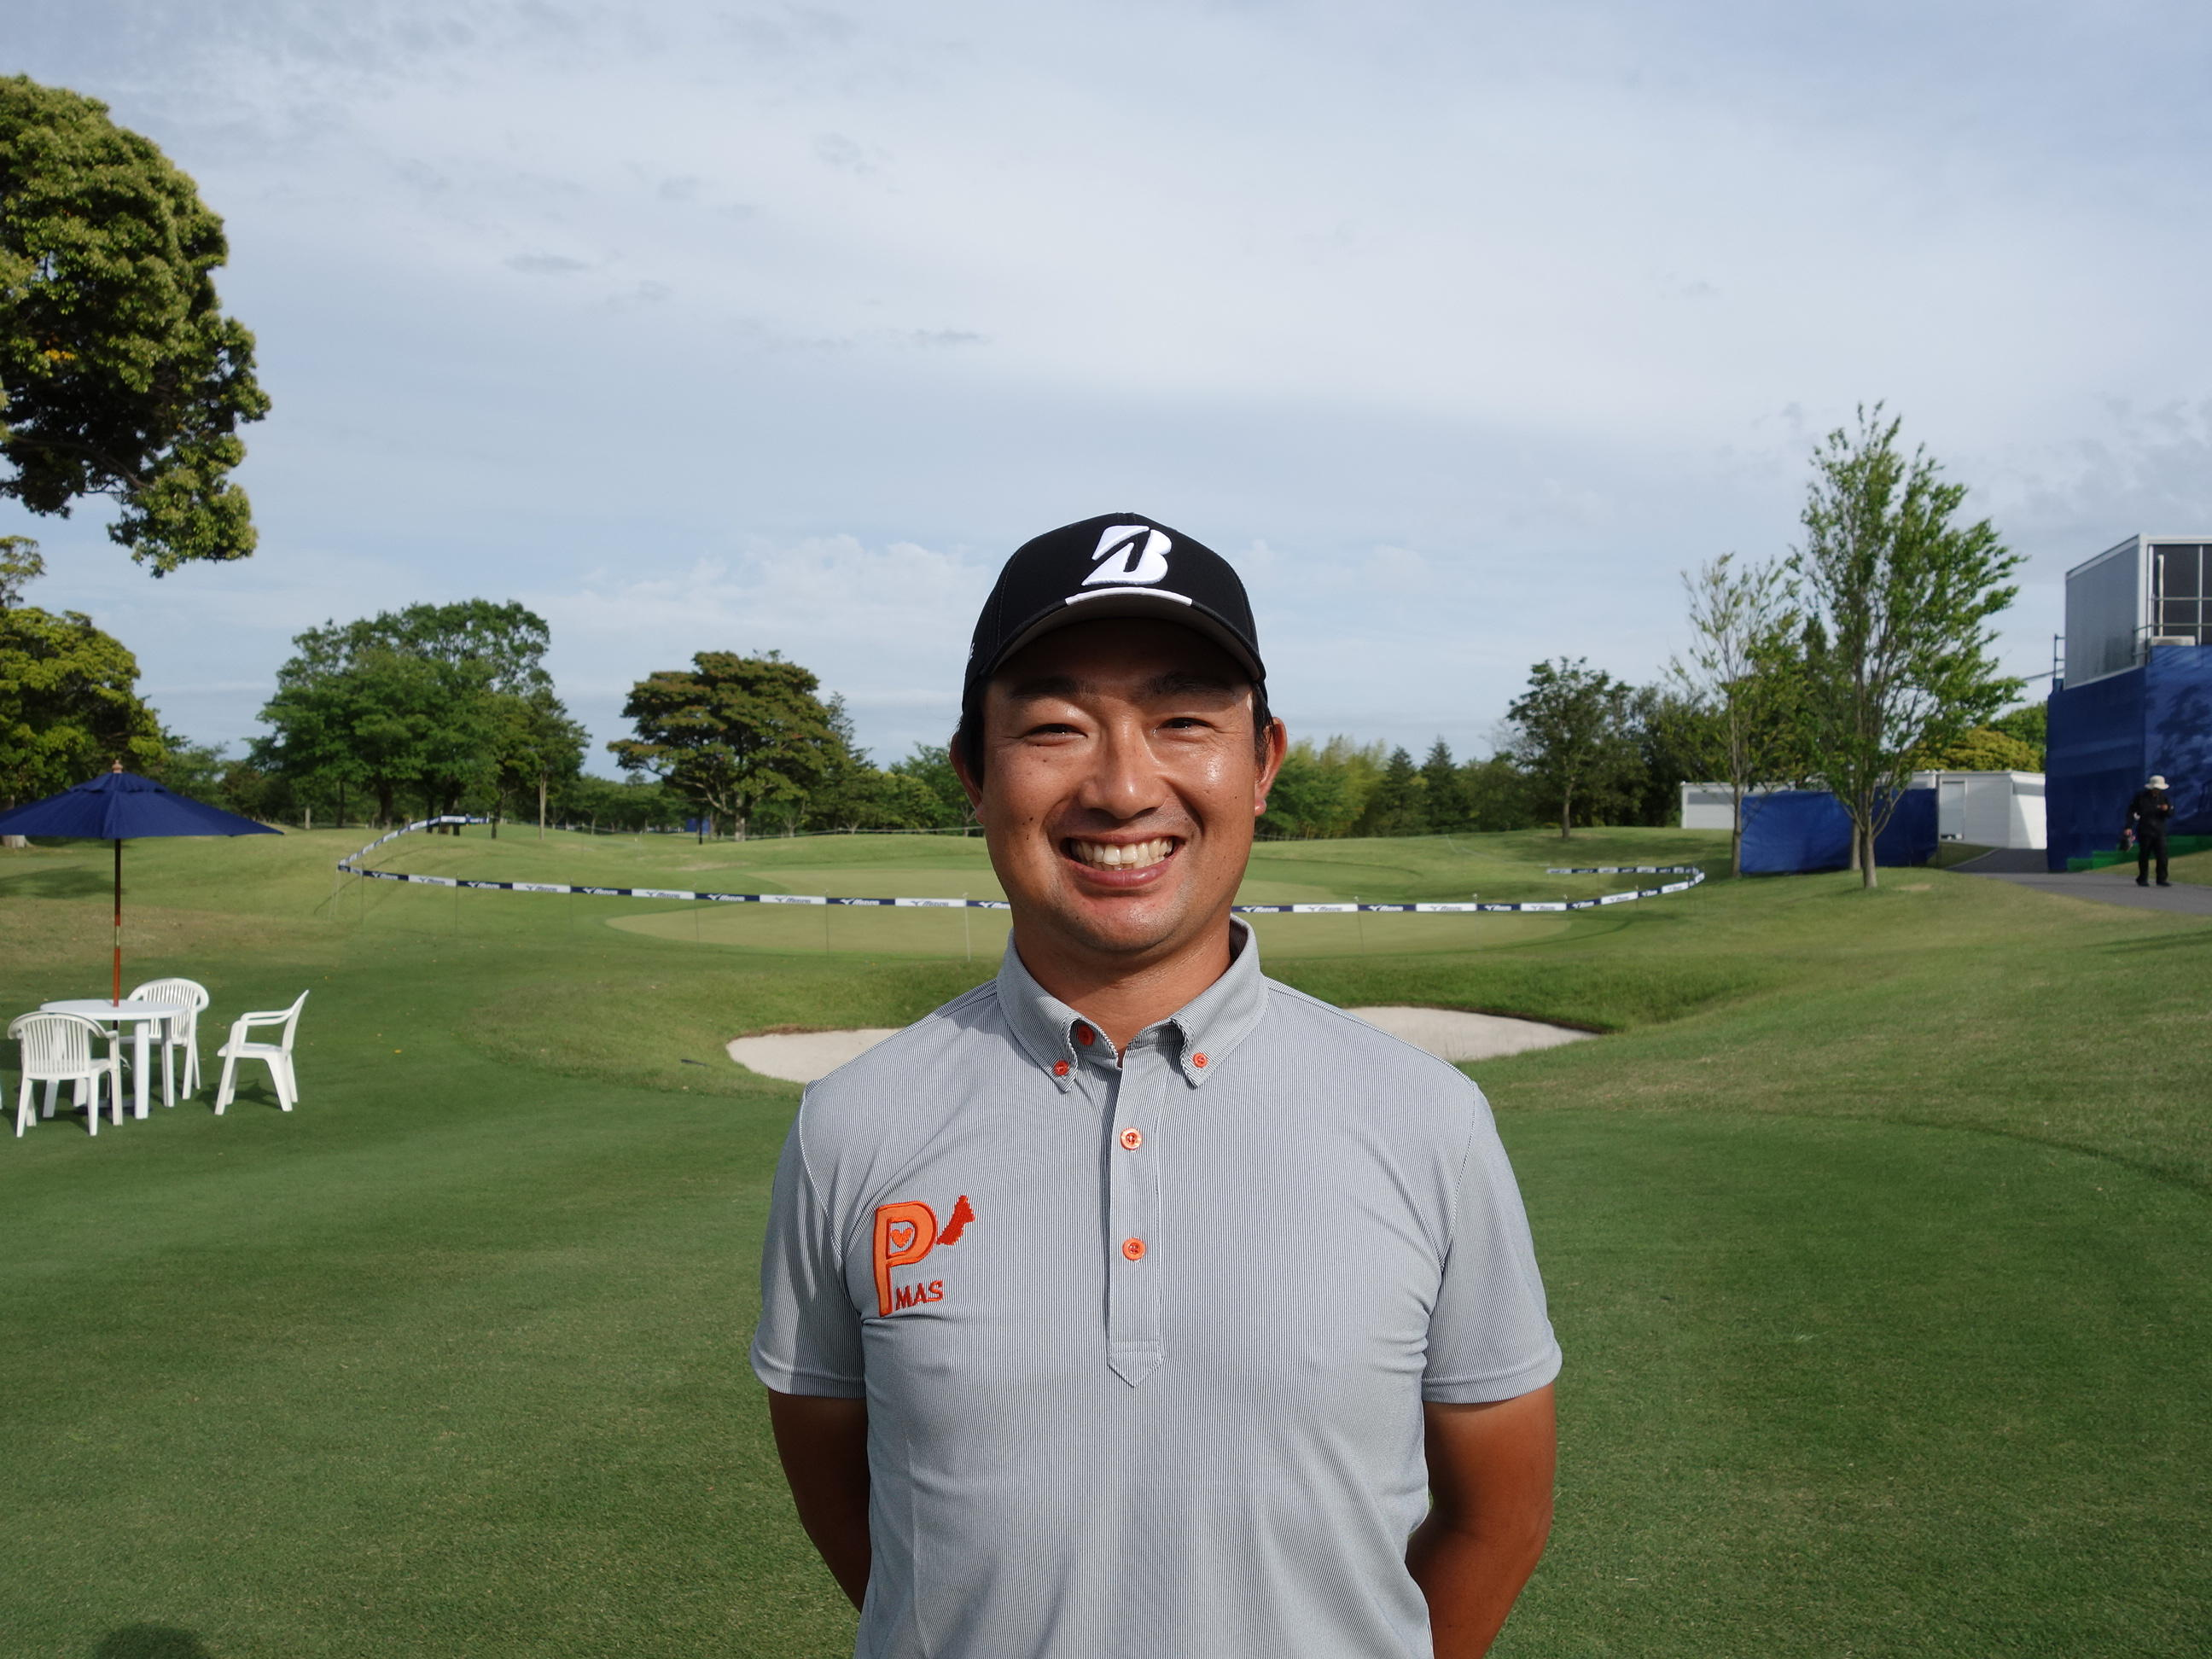 https://www.bs-golf.com/pro/0022926a453dc53f329cbcd0c3c5248a4e0e12e1.JPG